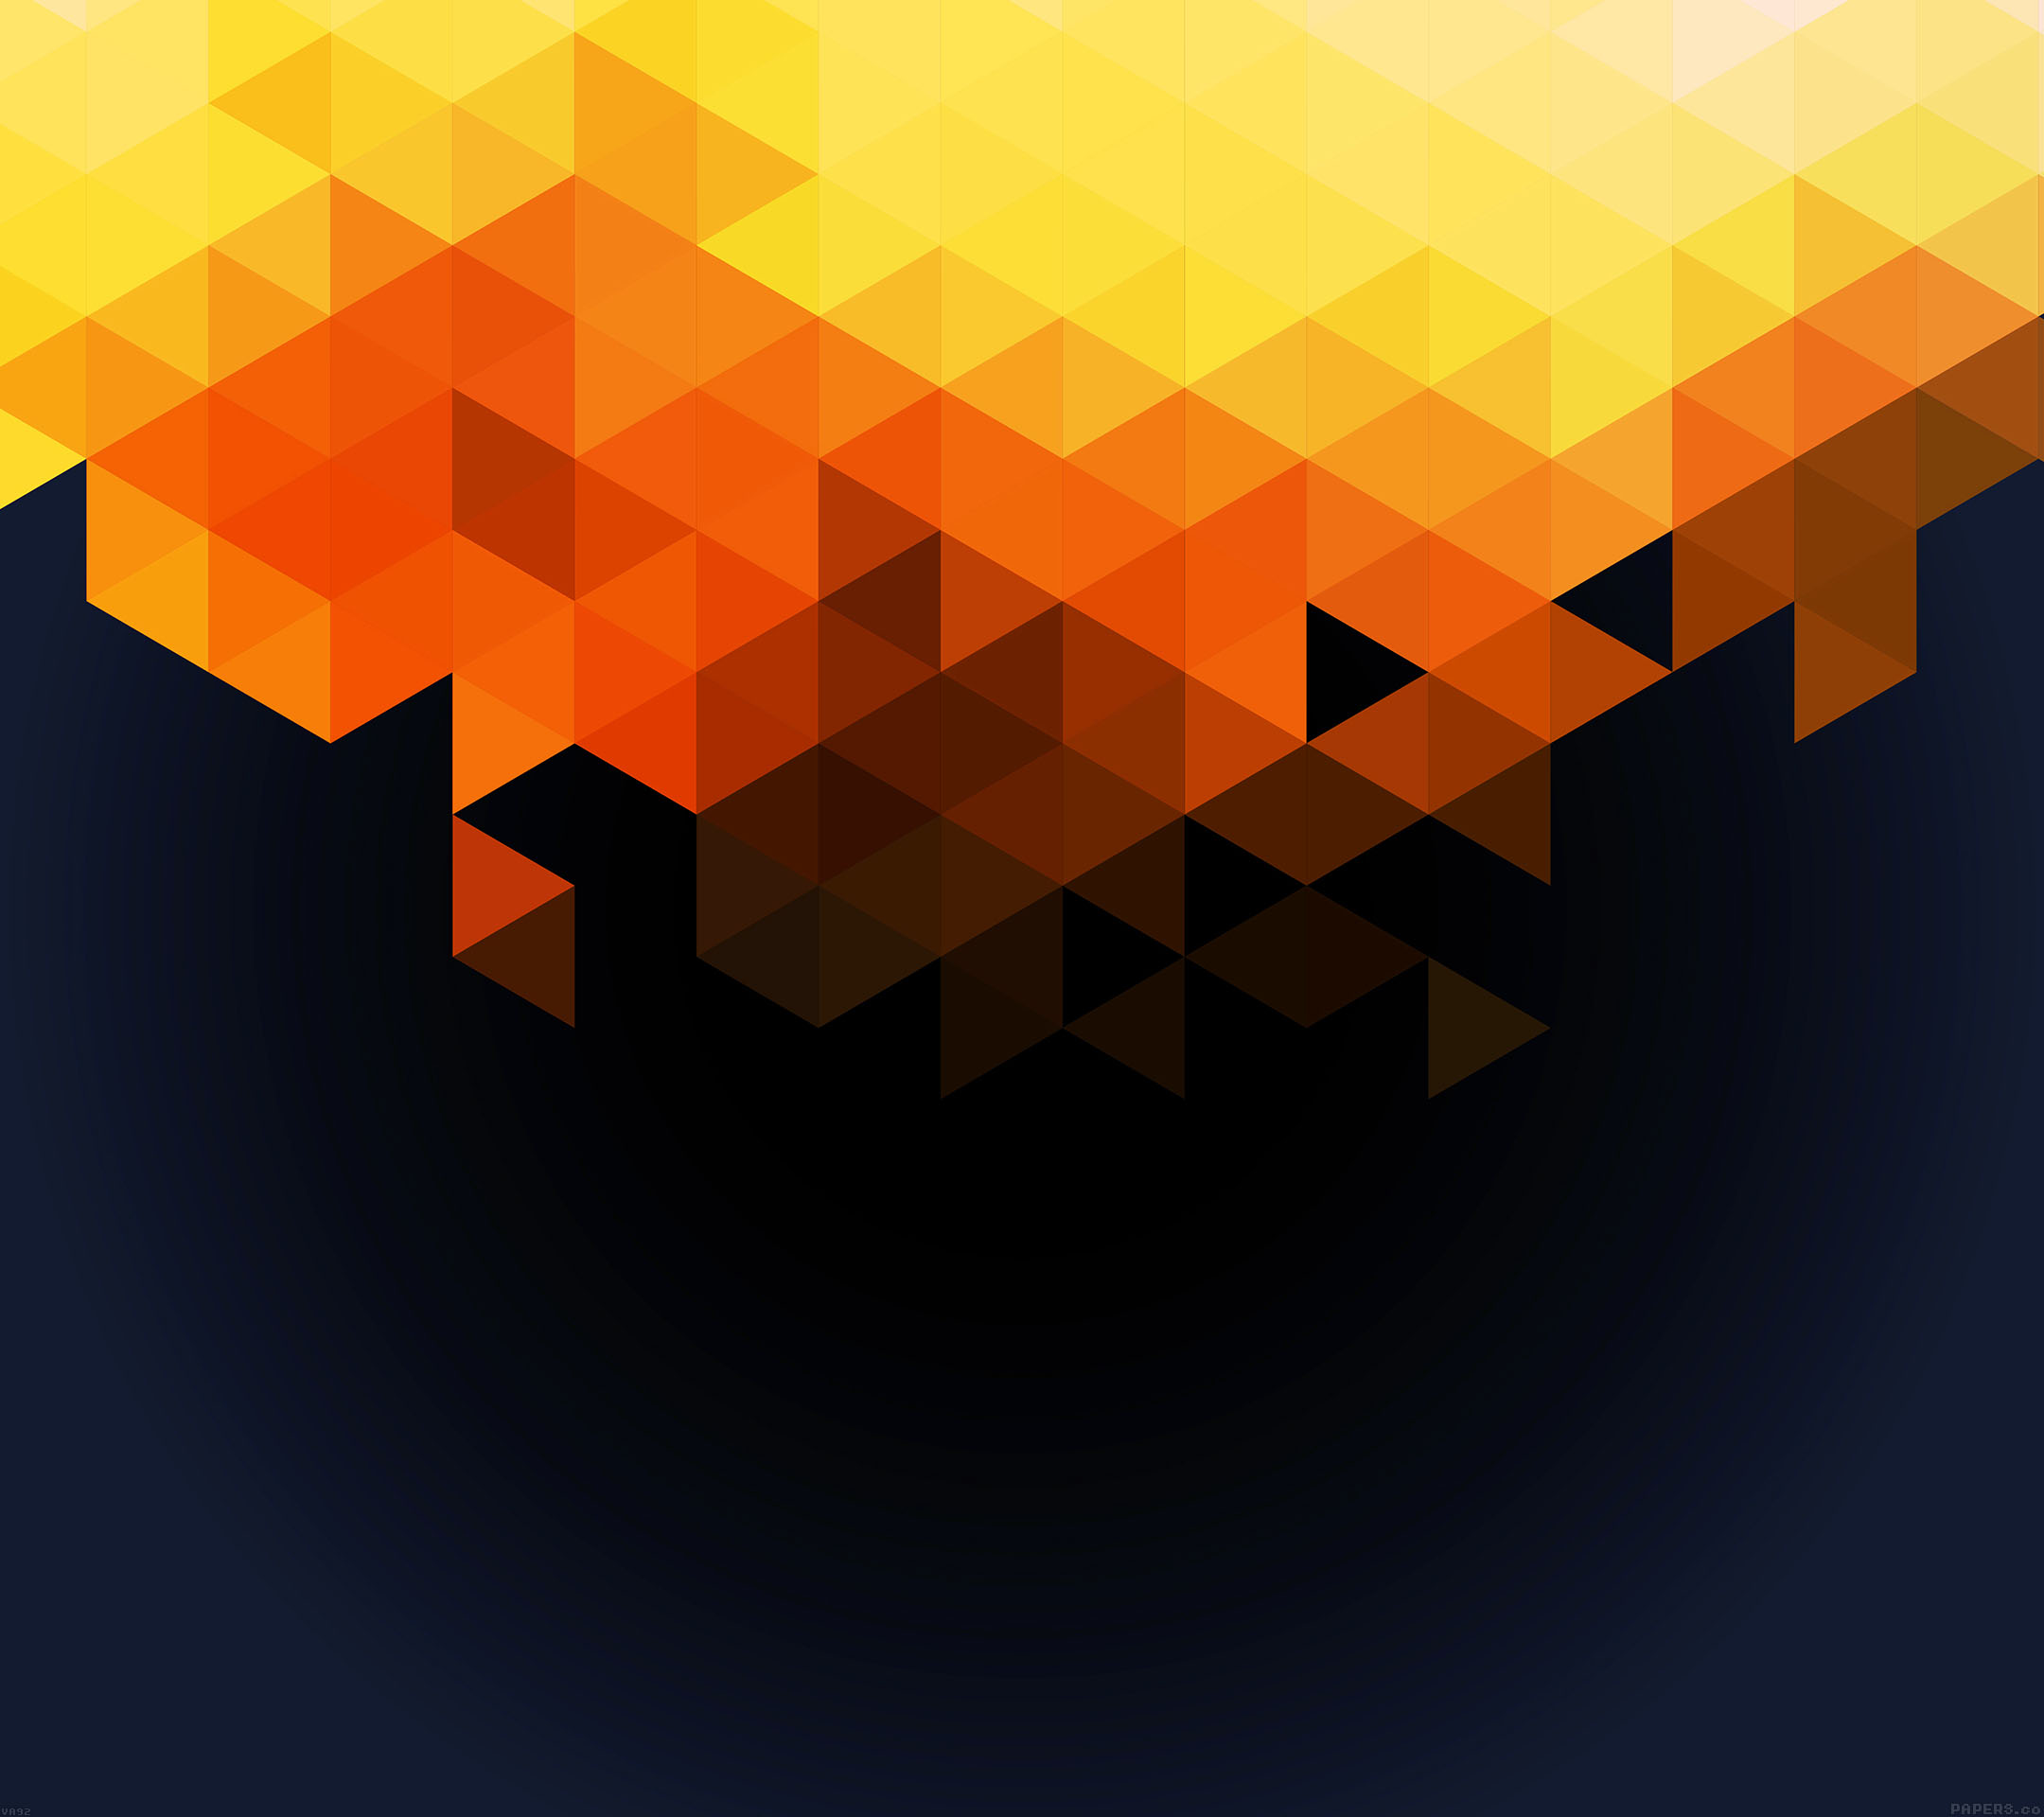 papers co-va92-wallpaper-triangle-fall-orange-pattern-15-wallpaper jpgTriangle Pattern Wallpaper